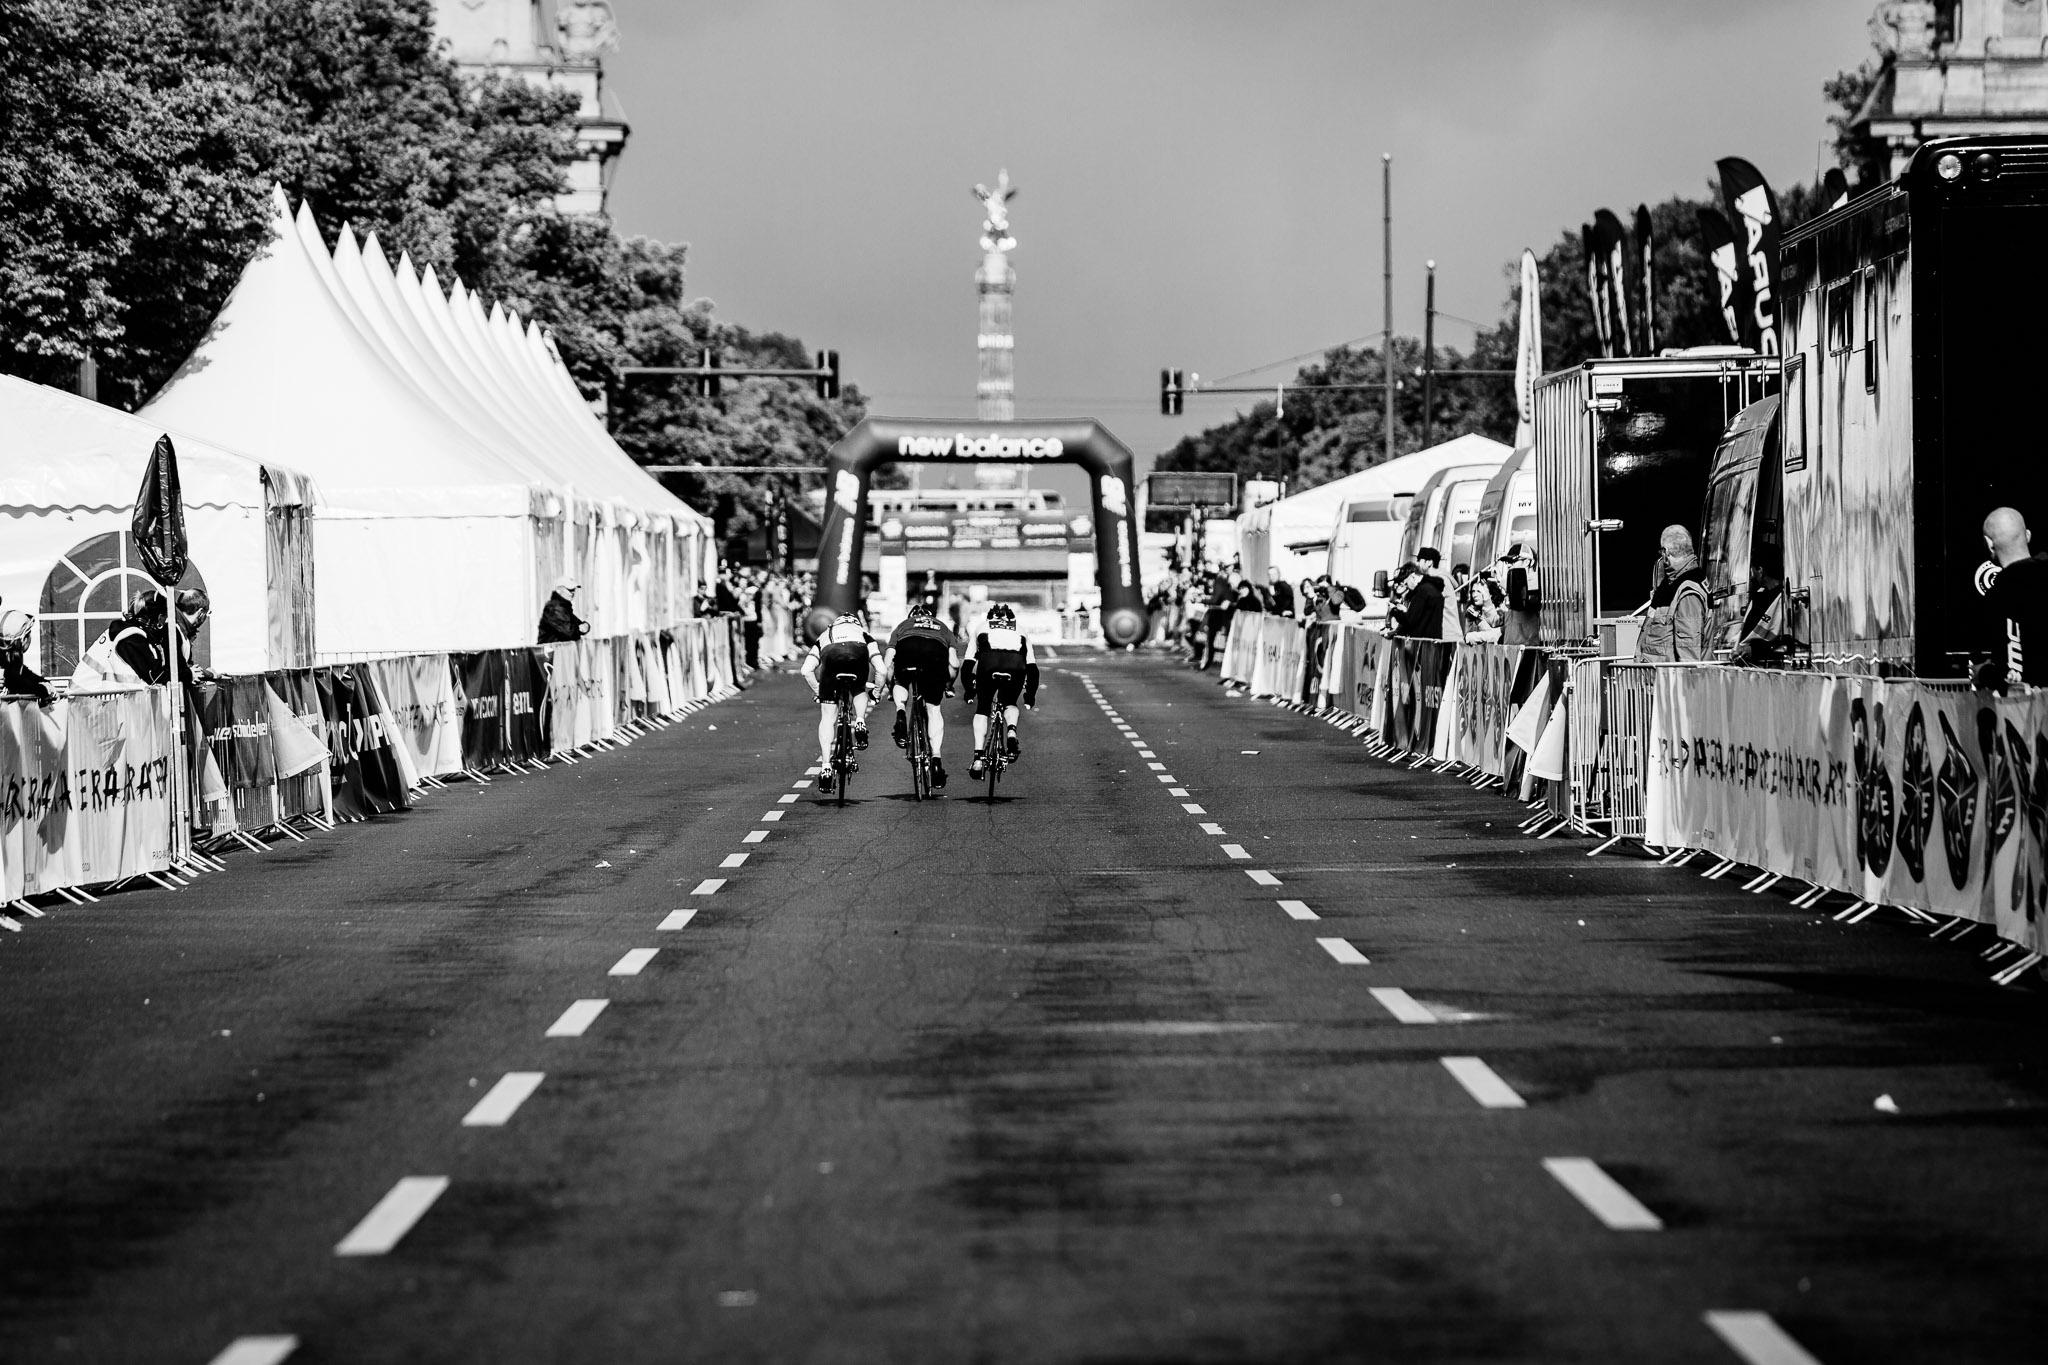 RAD RACE Battle, Berlin May 30 2015 Photo by Björn Lexius_17.jpg